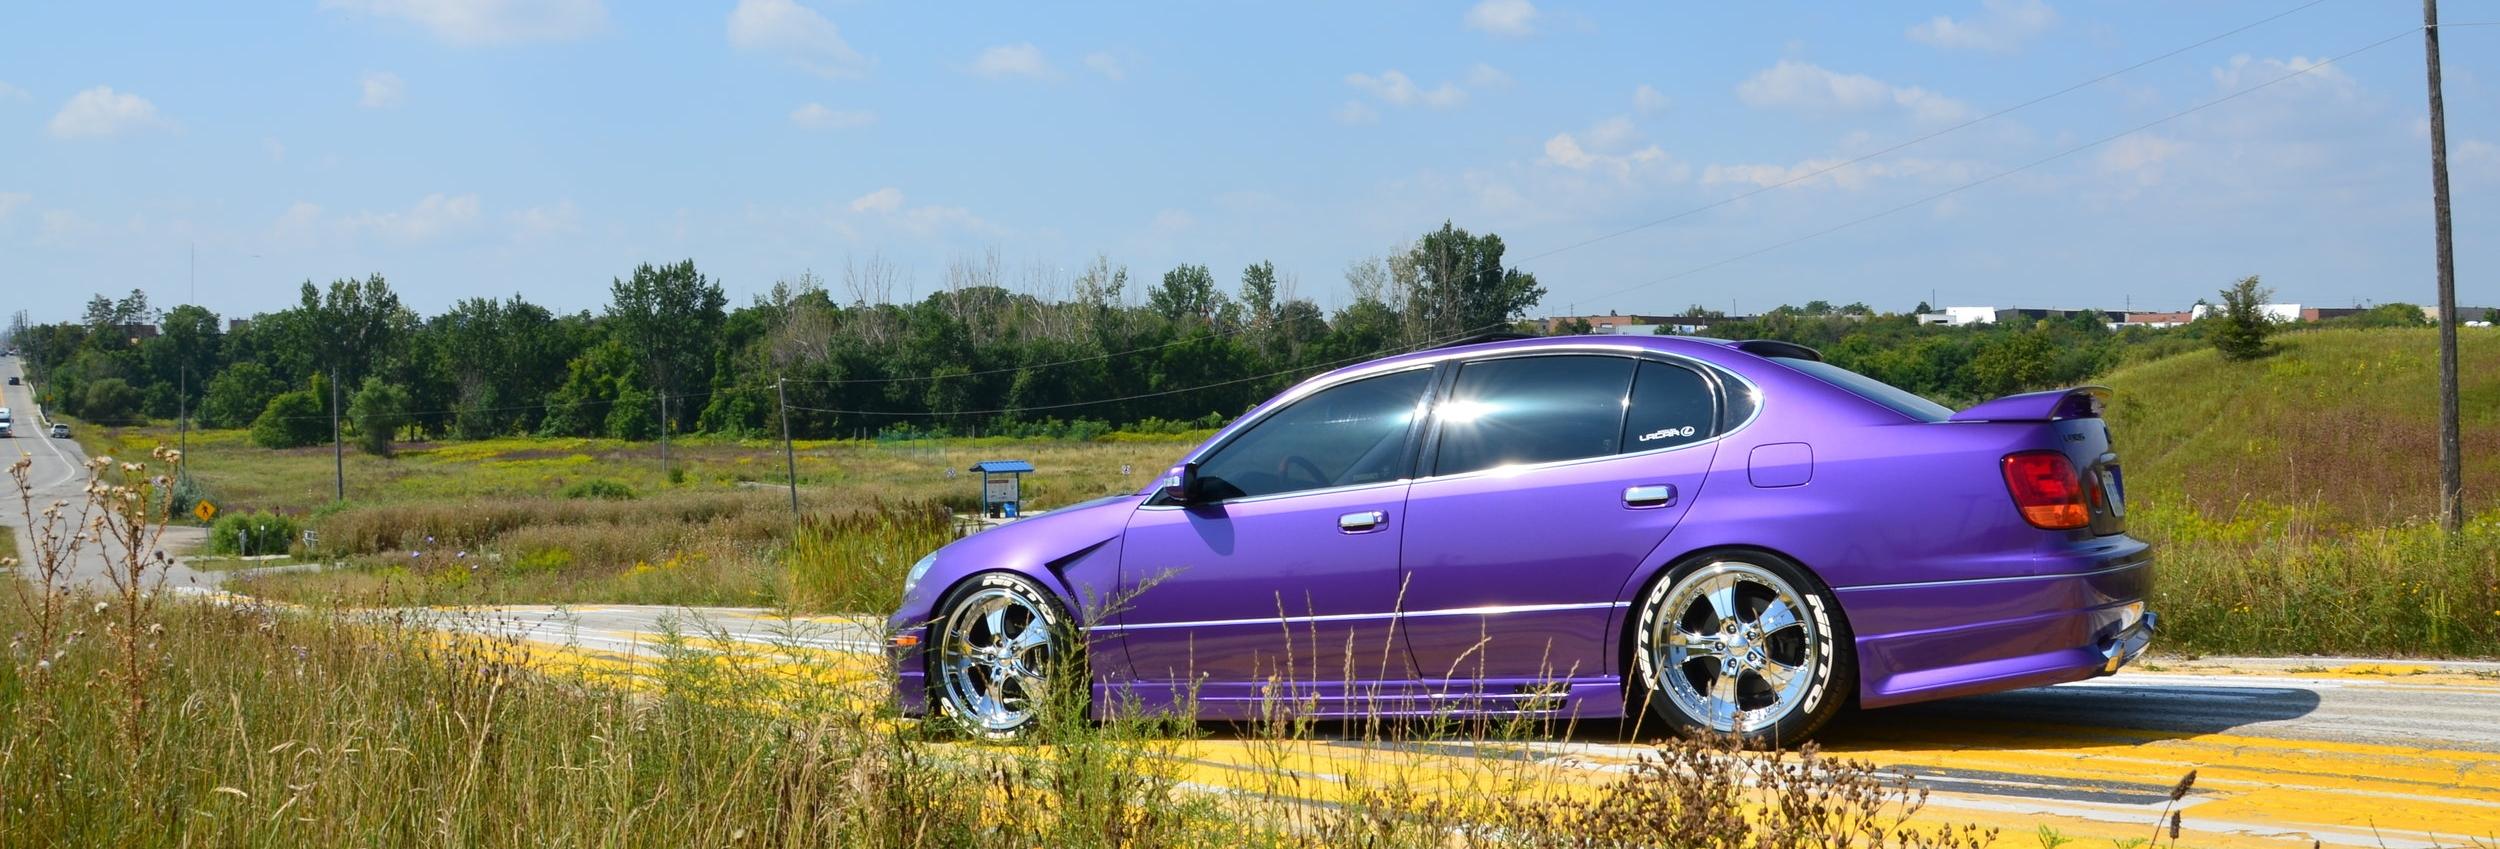 LEXUS GS400 Wrapped using Oracal Violet Metallic